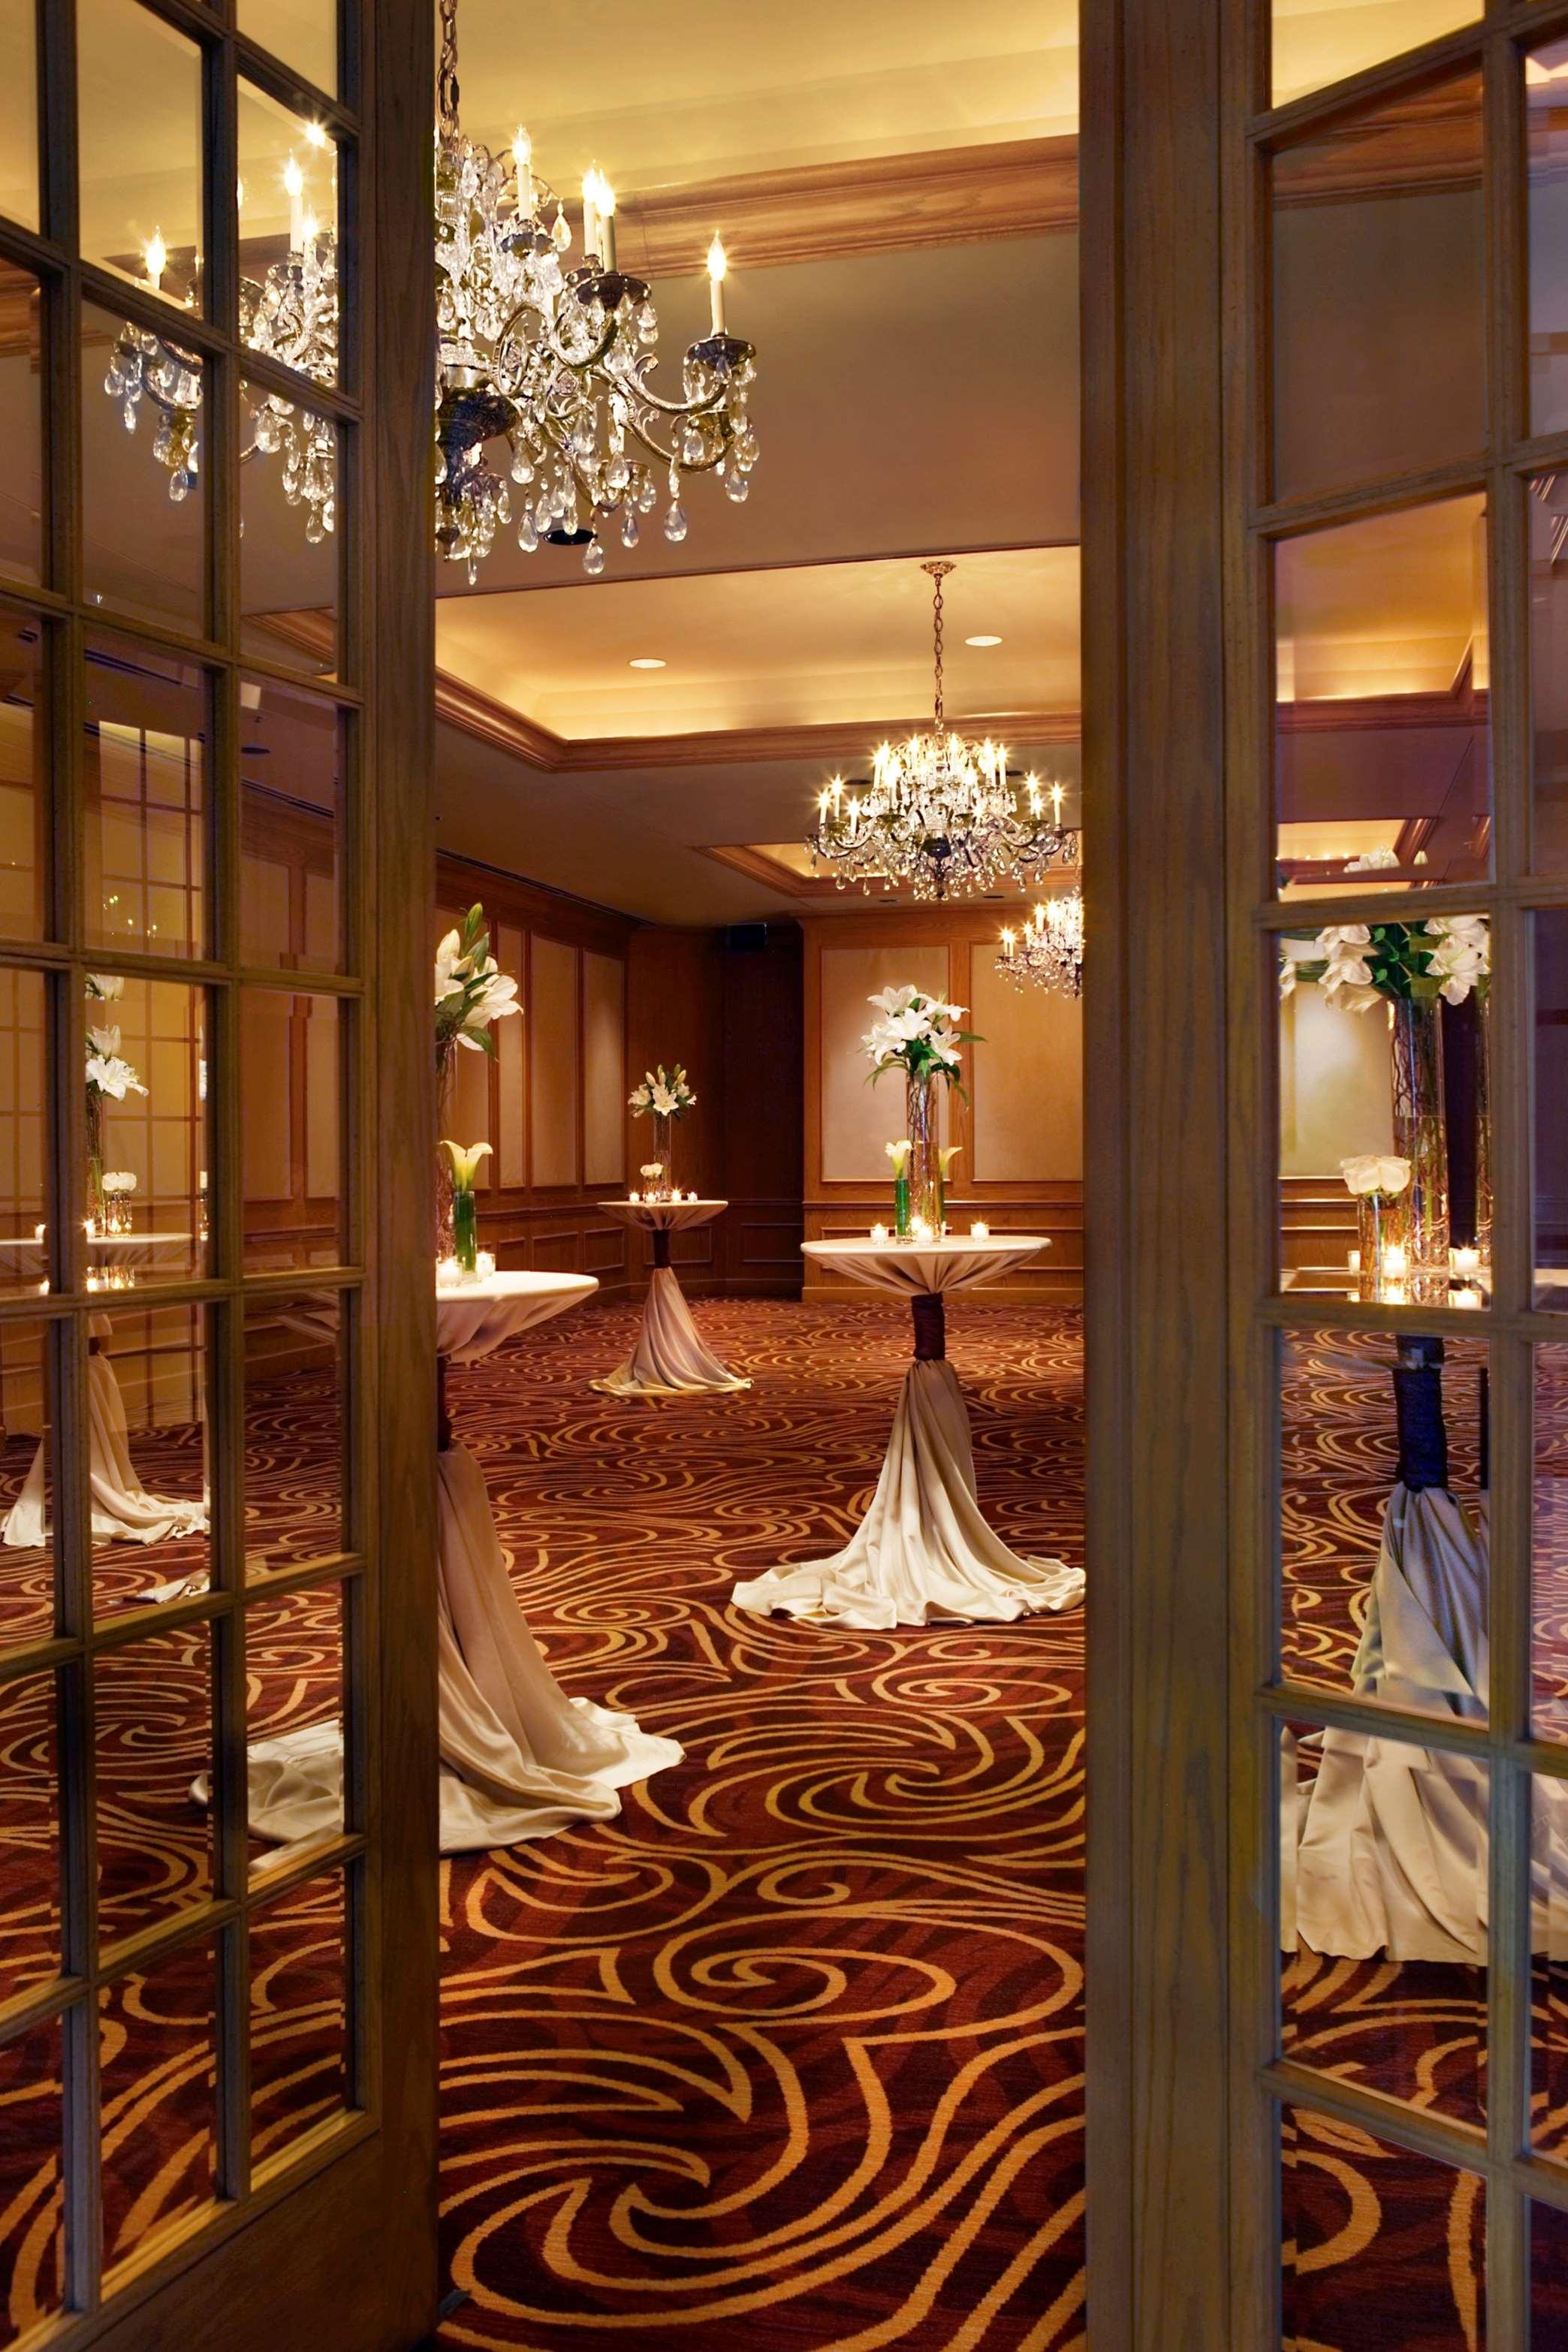 Hilton Rosemont/Chicago O'Hare image 19